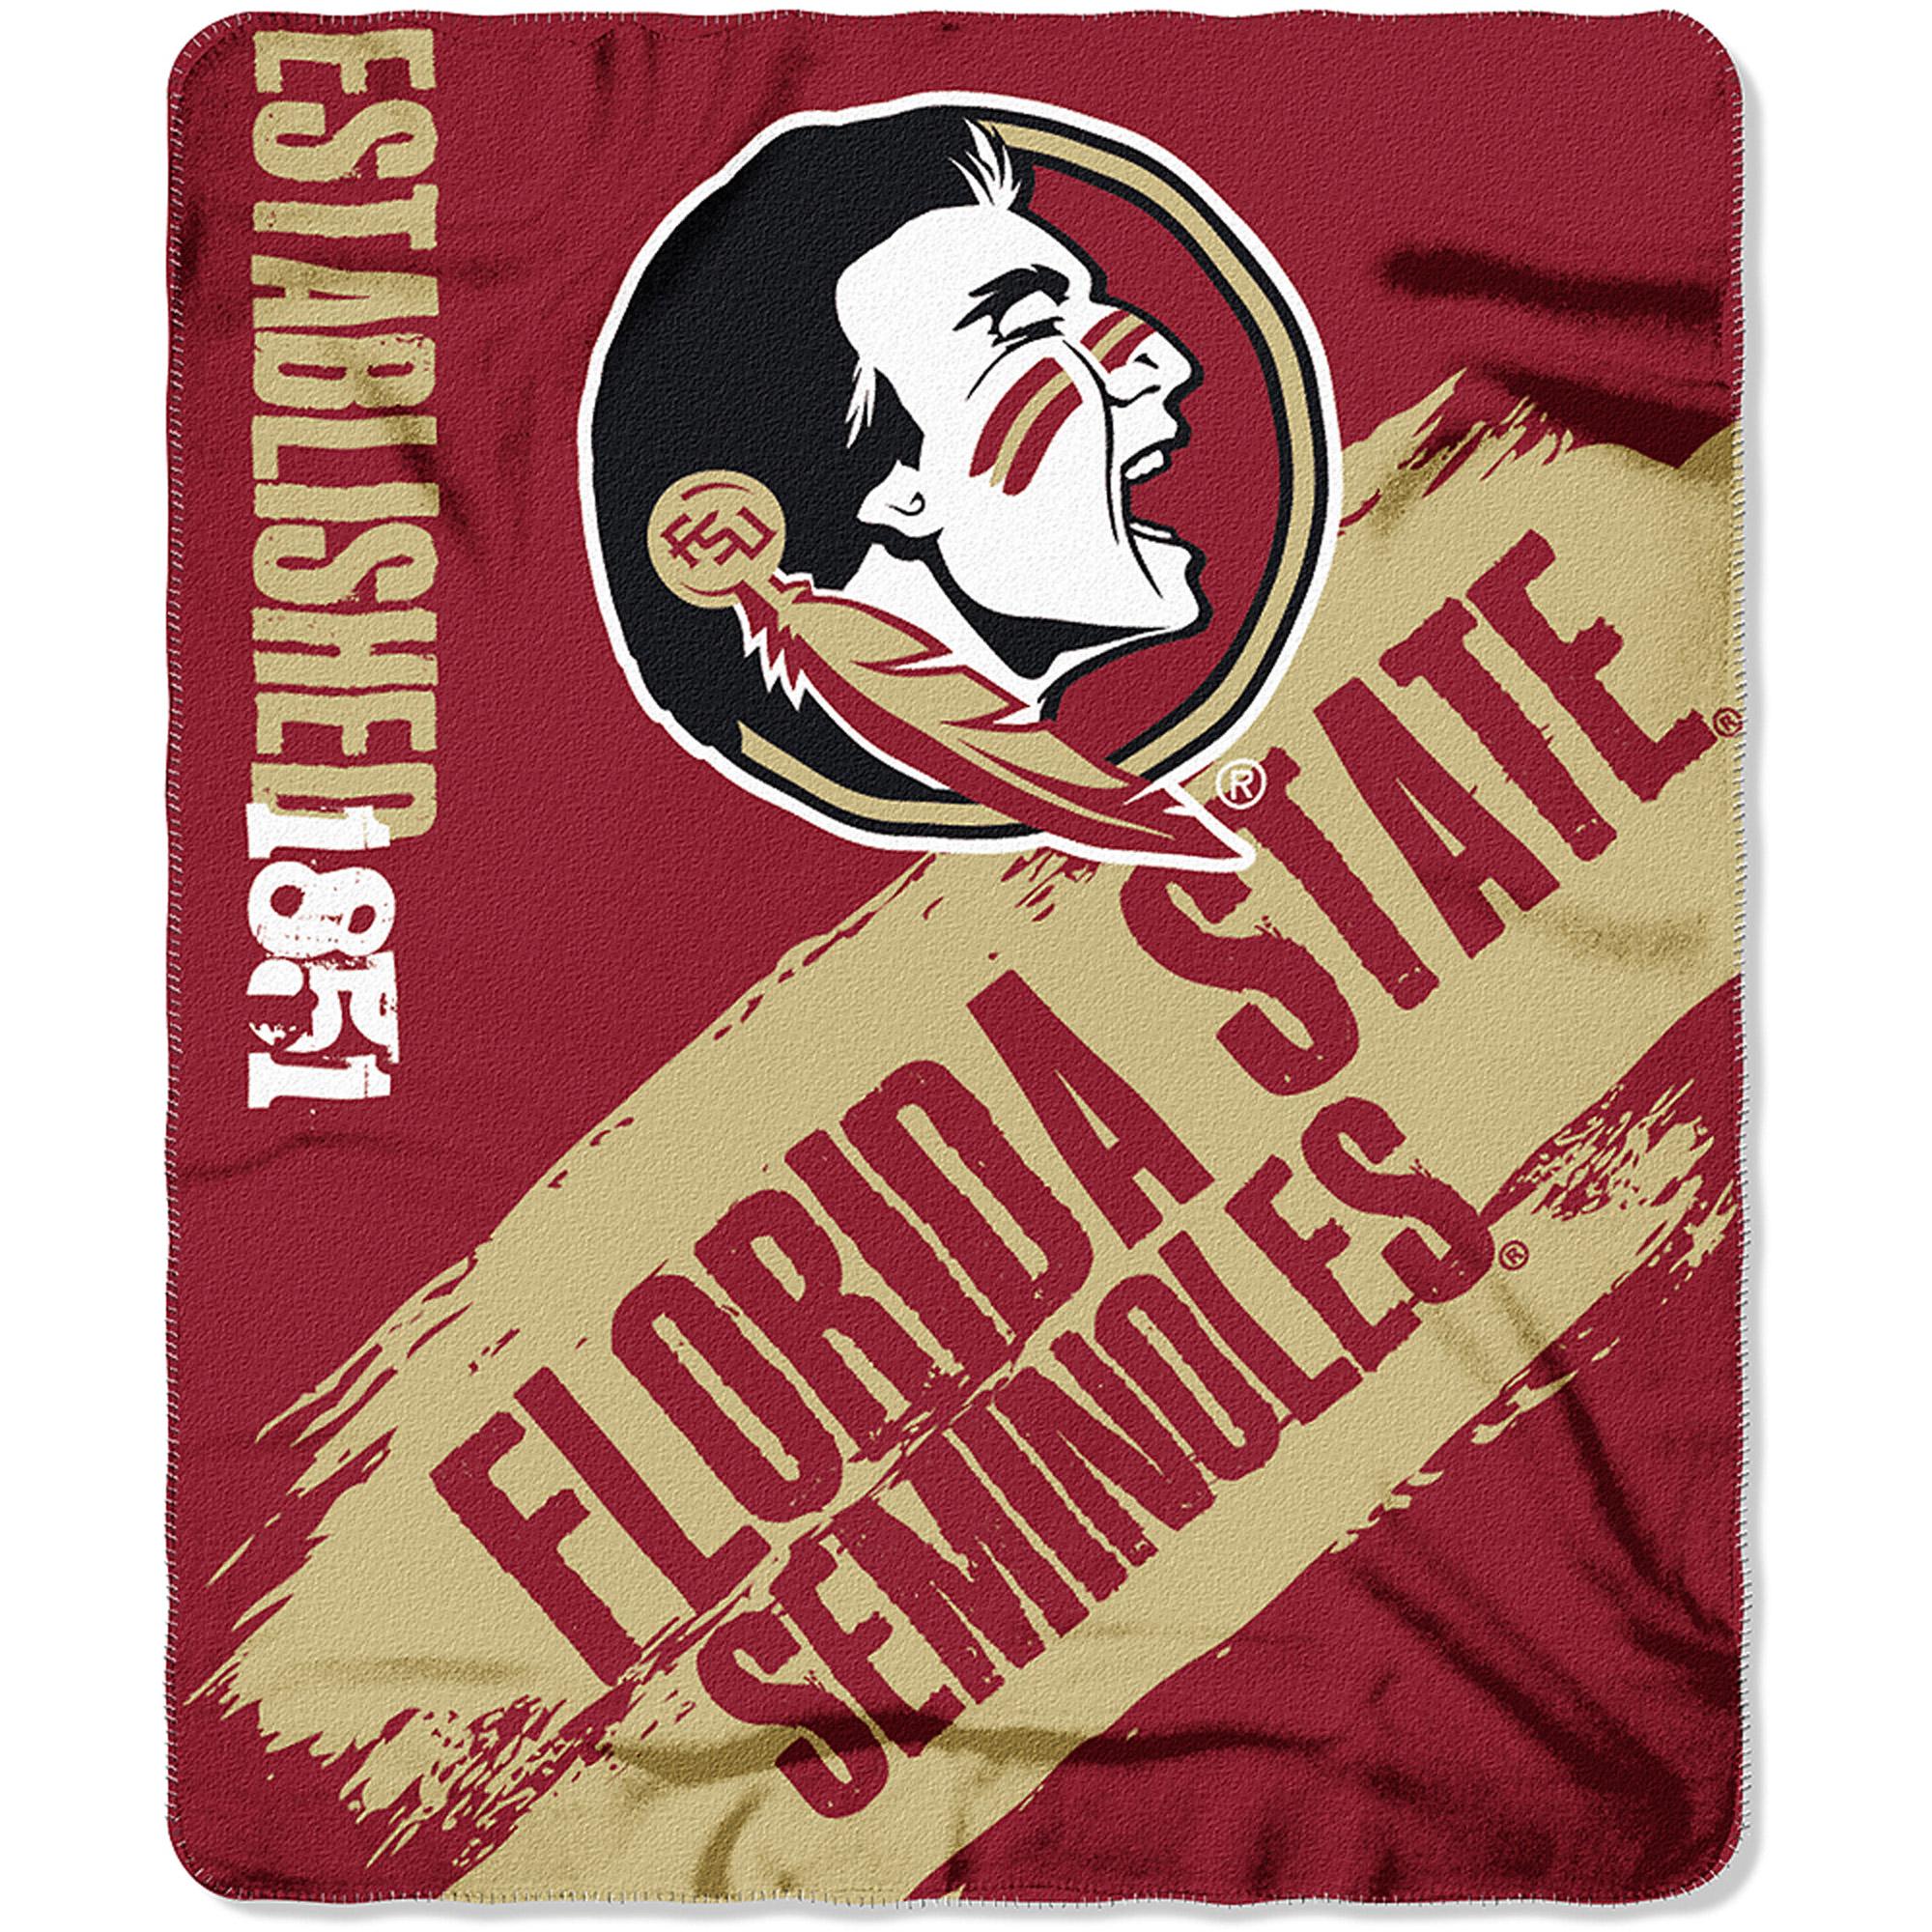 "NCAA Florida State Seminoles 50"" x 60"" Fleece Throw"